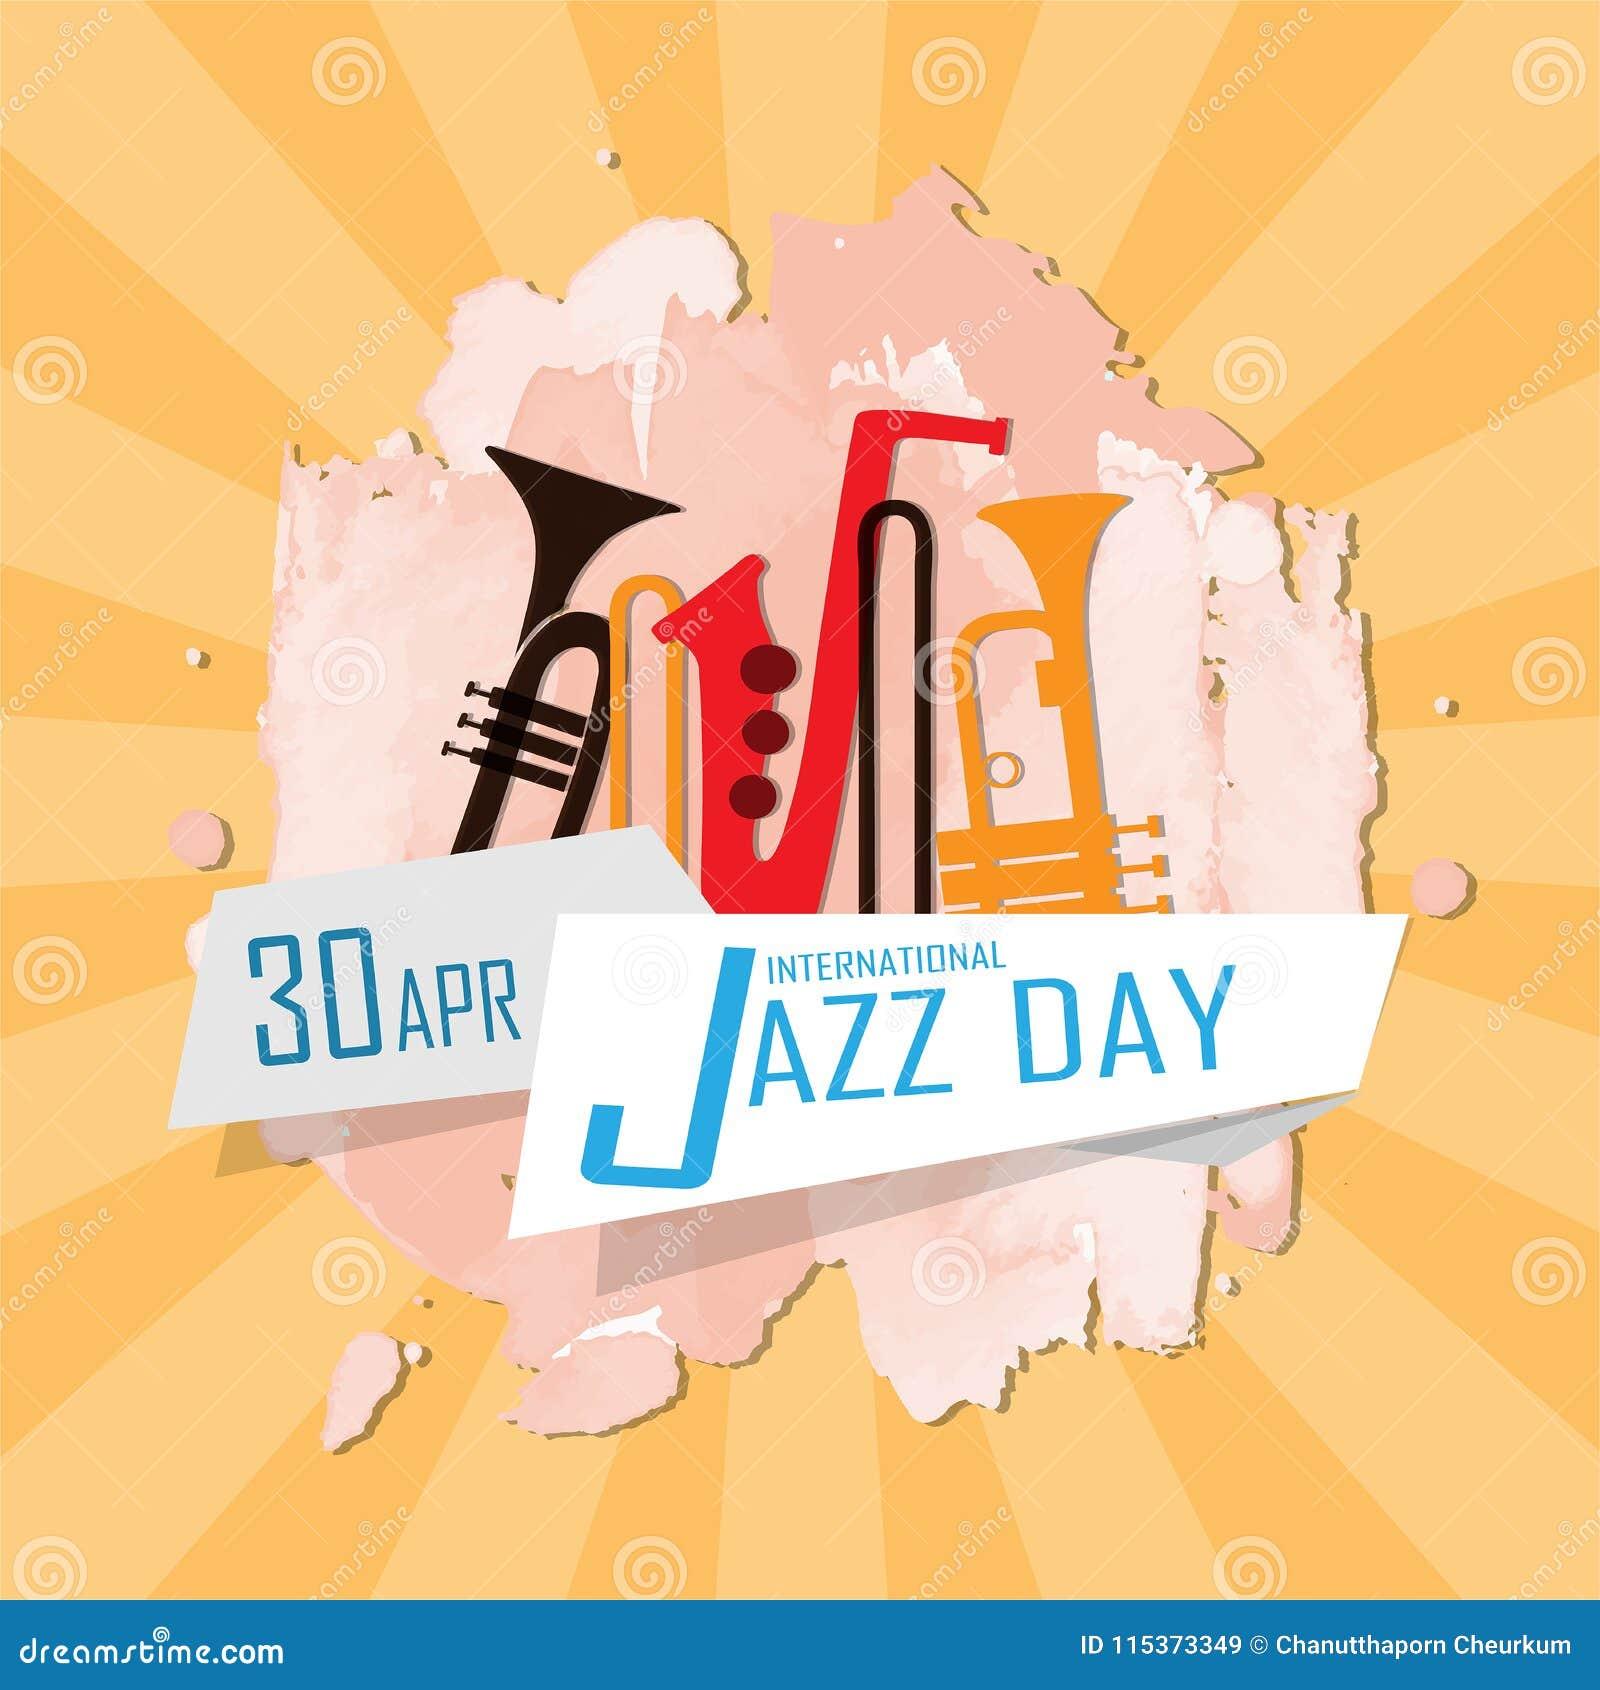 International Jazz Day stock illustration. Illustration of banner -  115373349